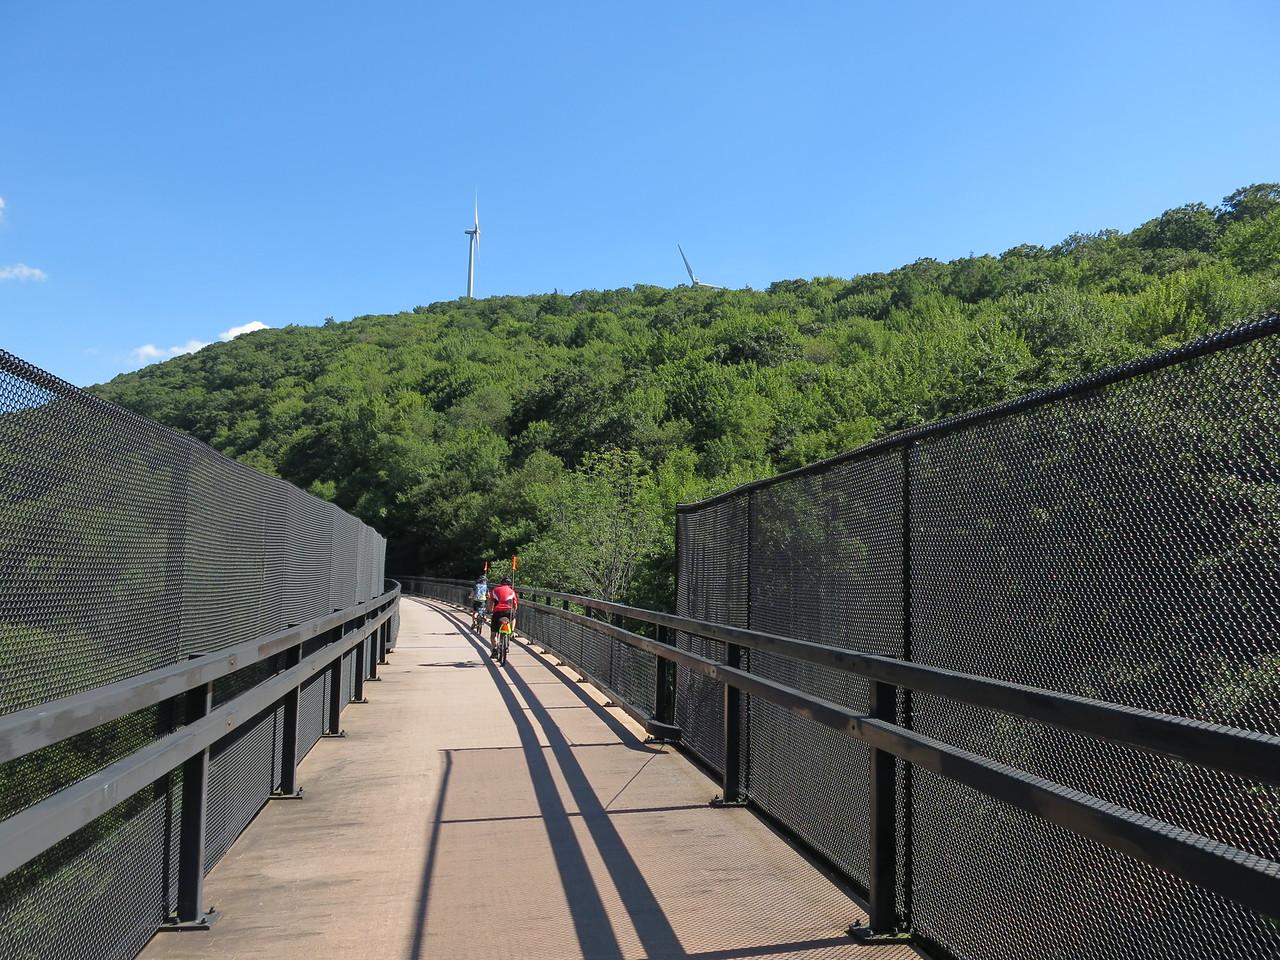 Keystone Viaduct